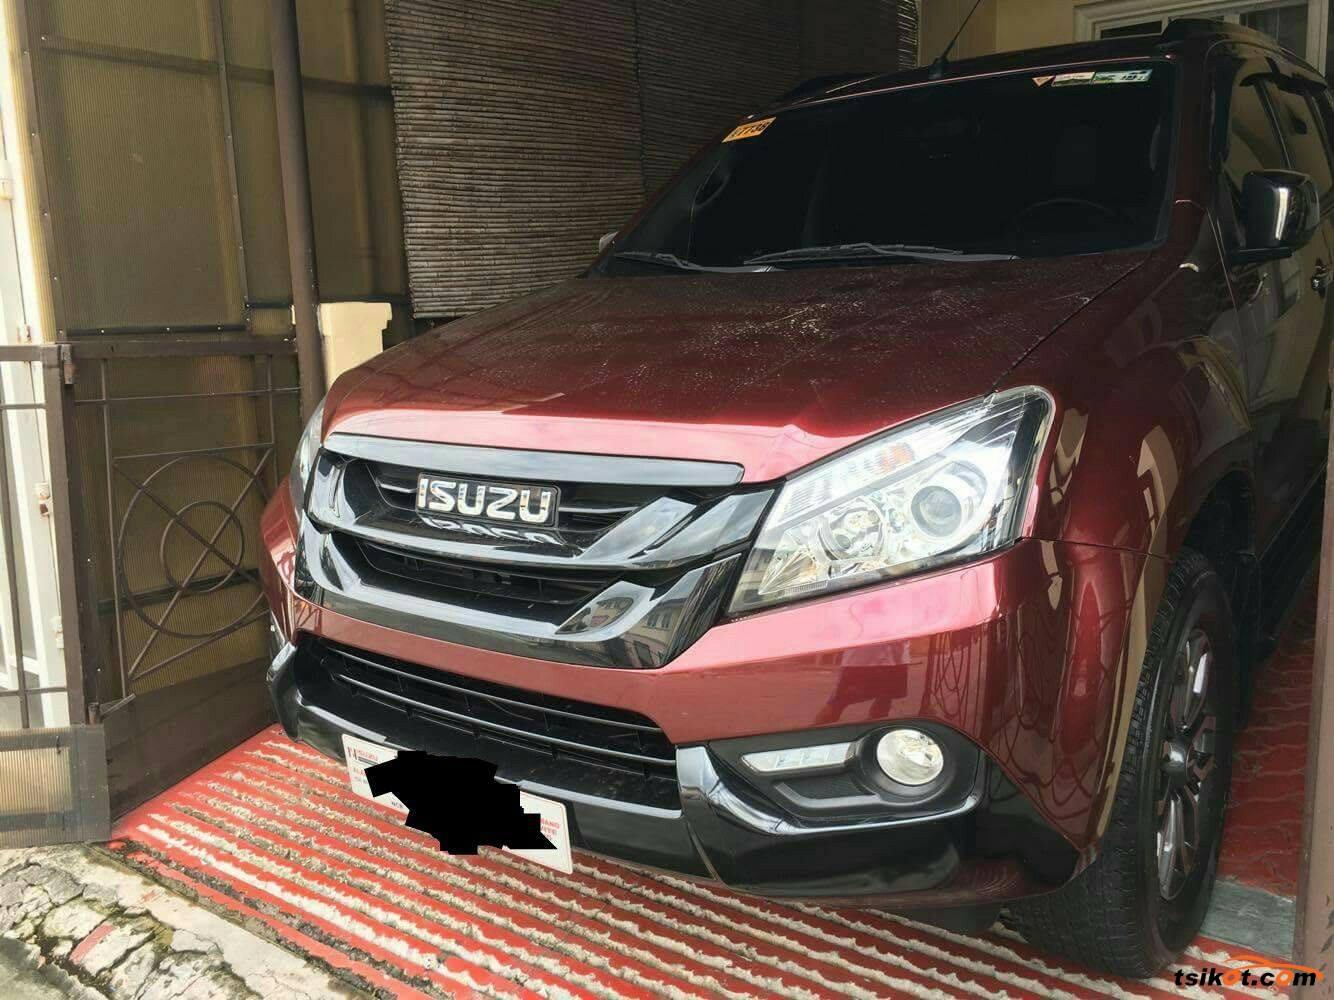 Isuzu Mu-X 2017 - 1